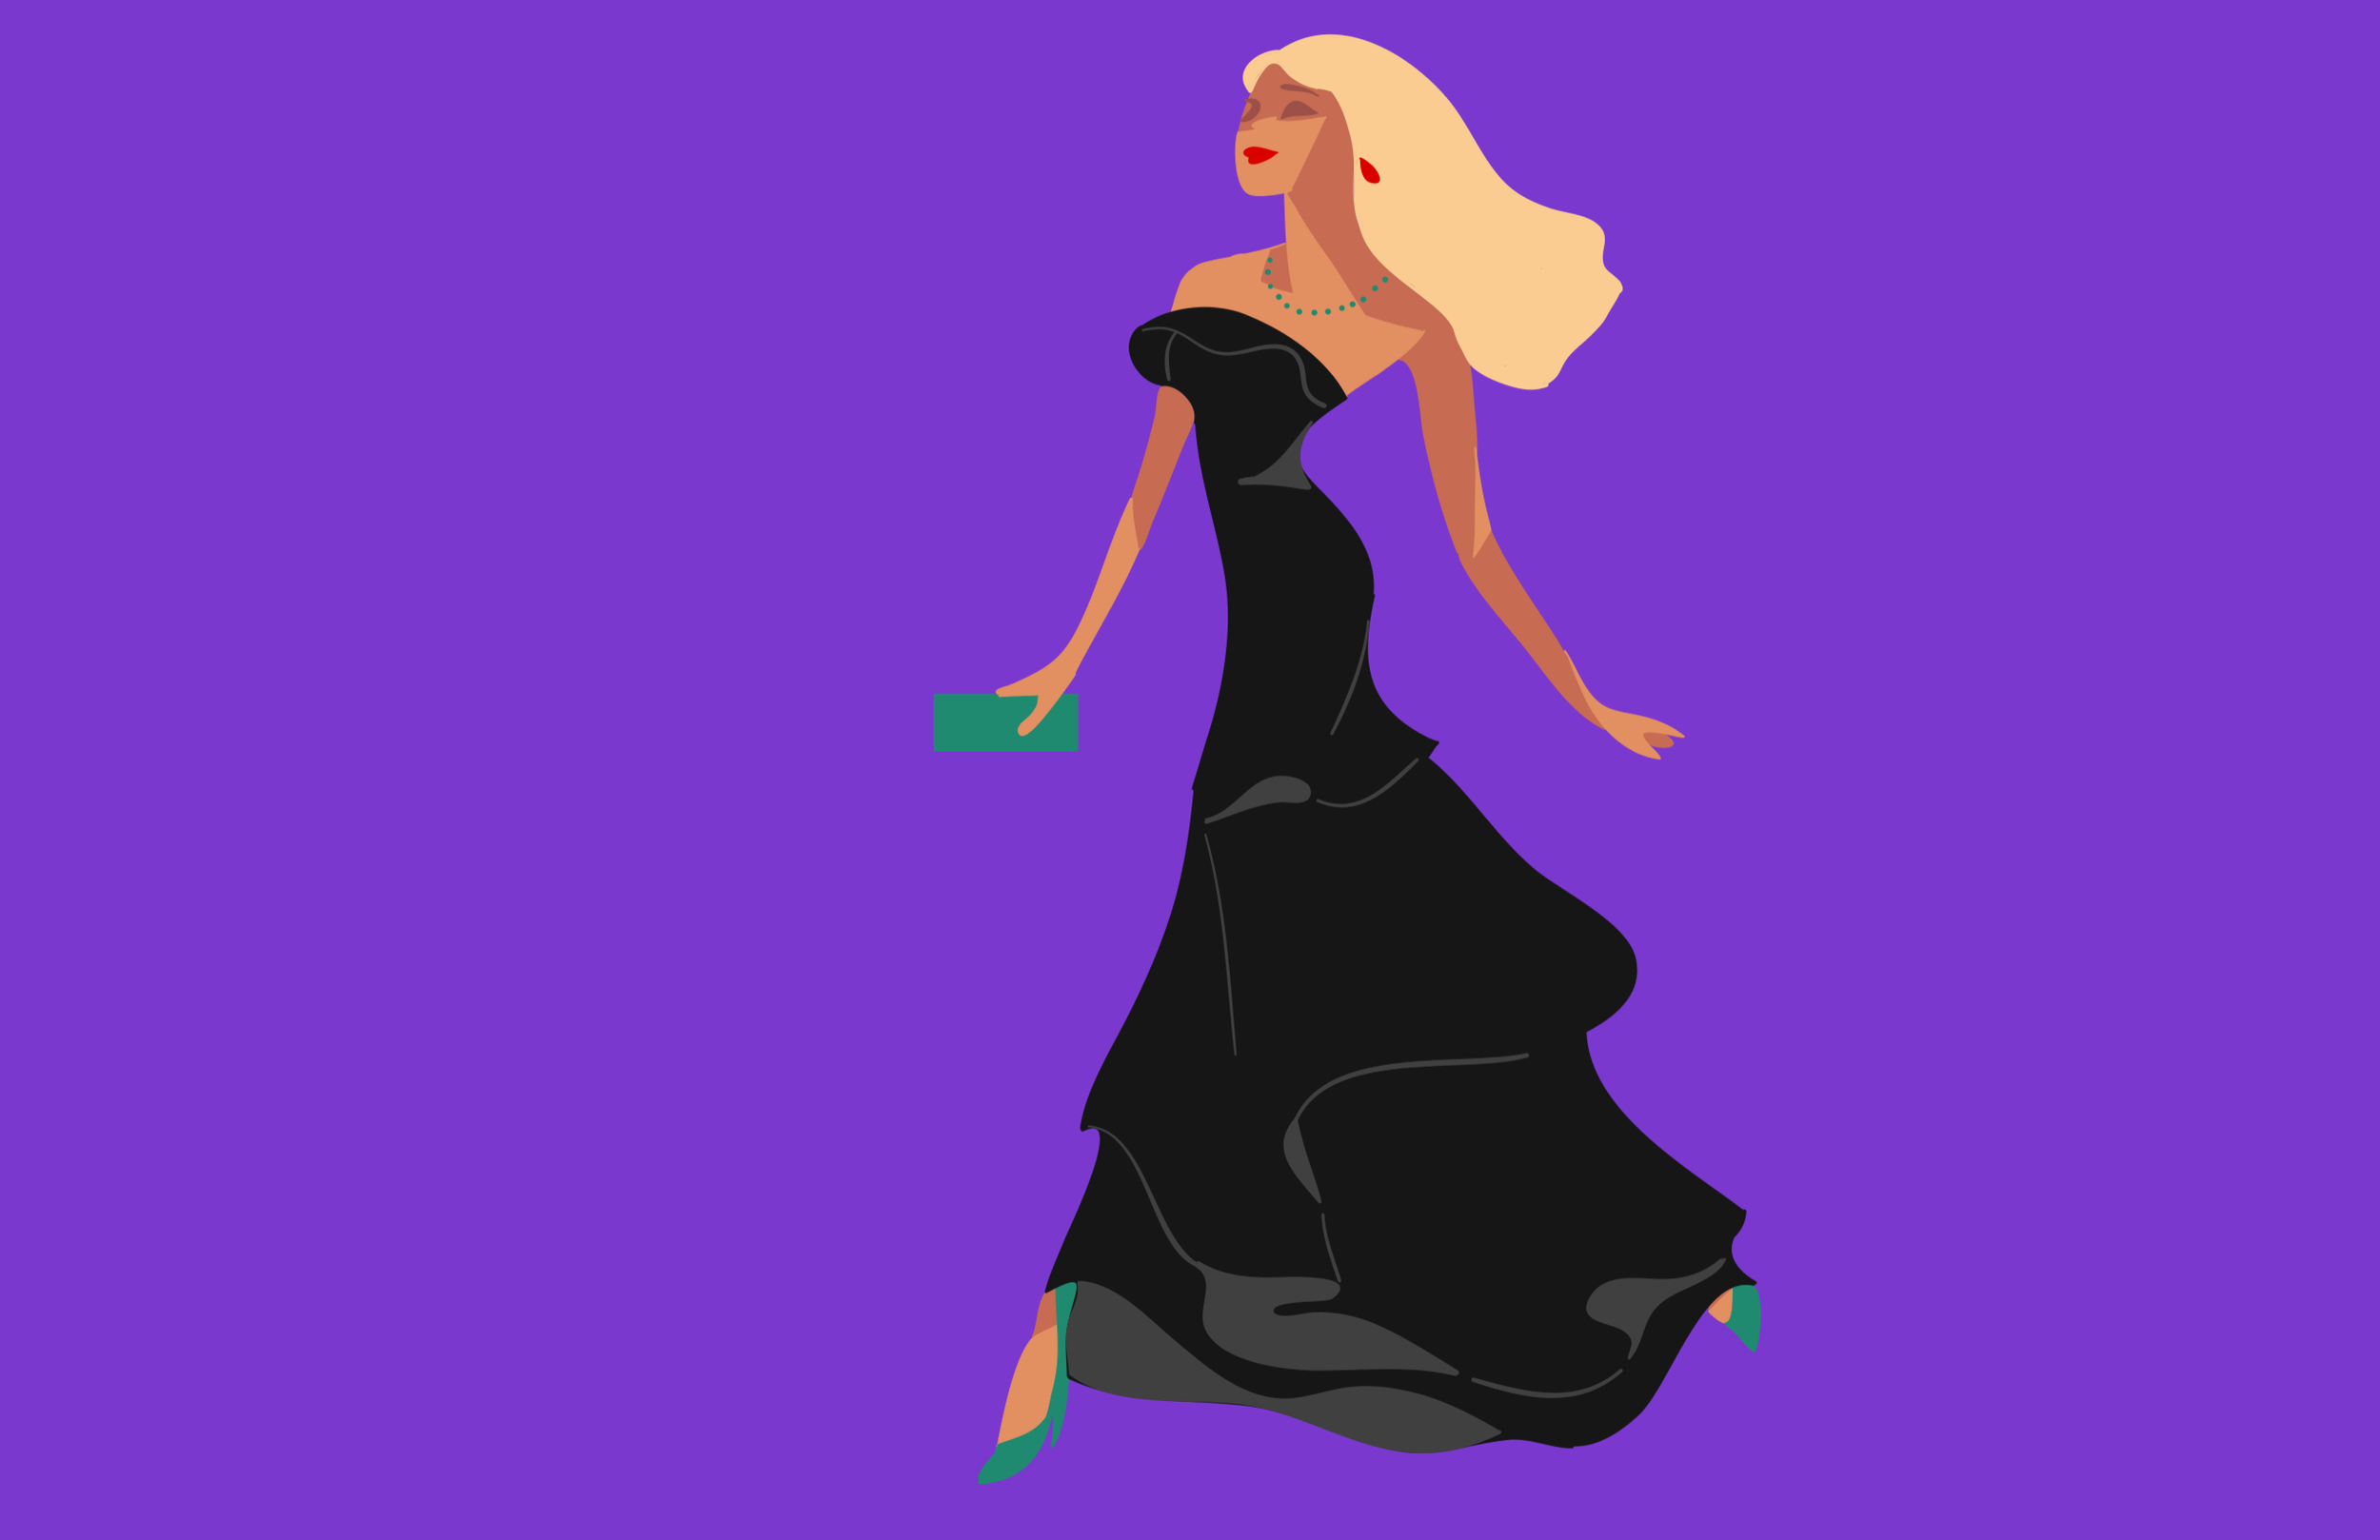 Aurora_Illustration.png